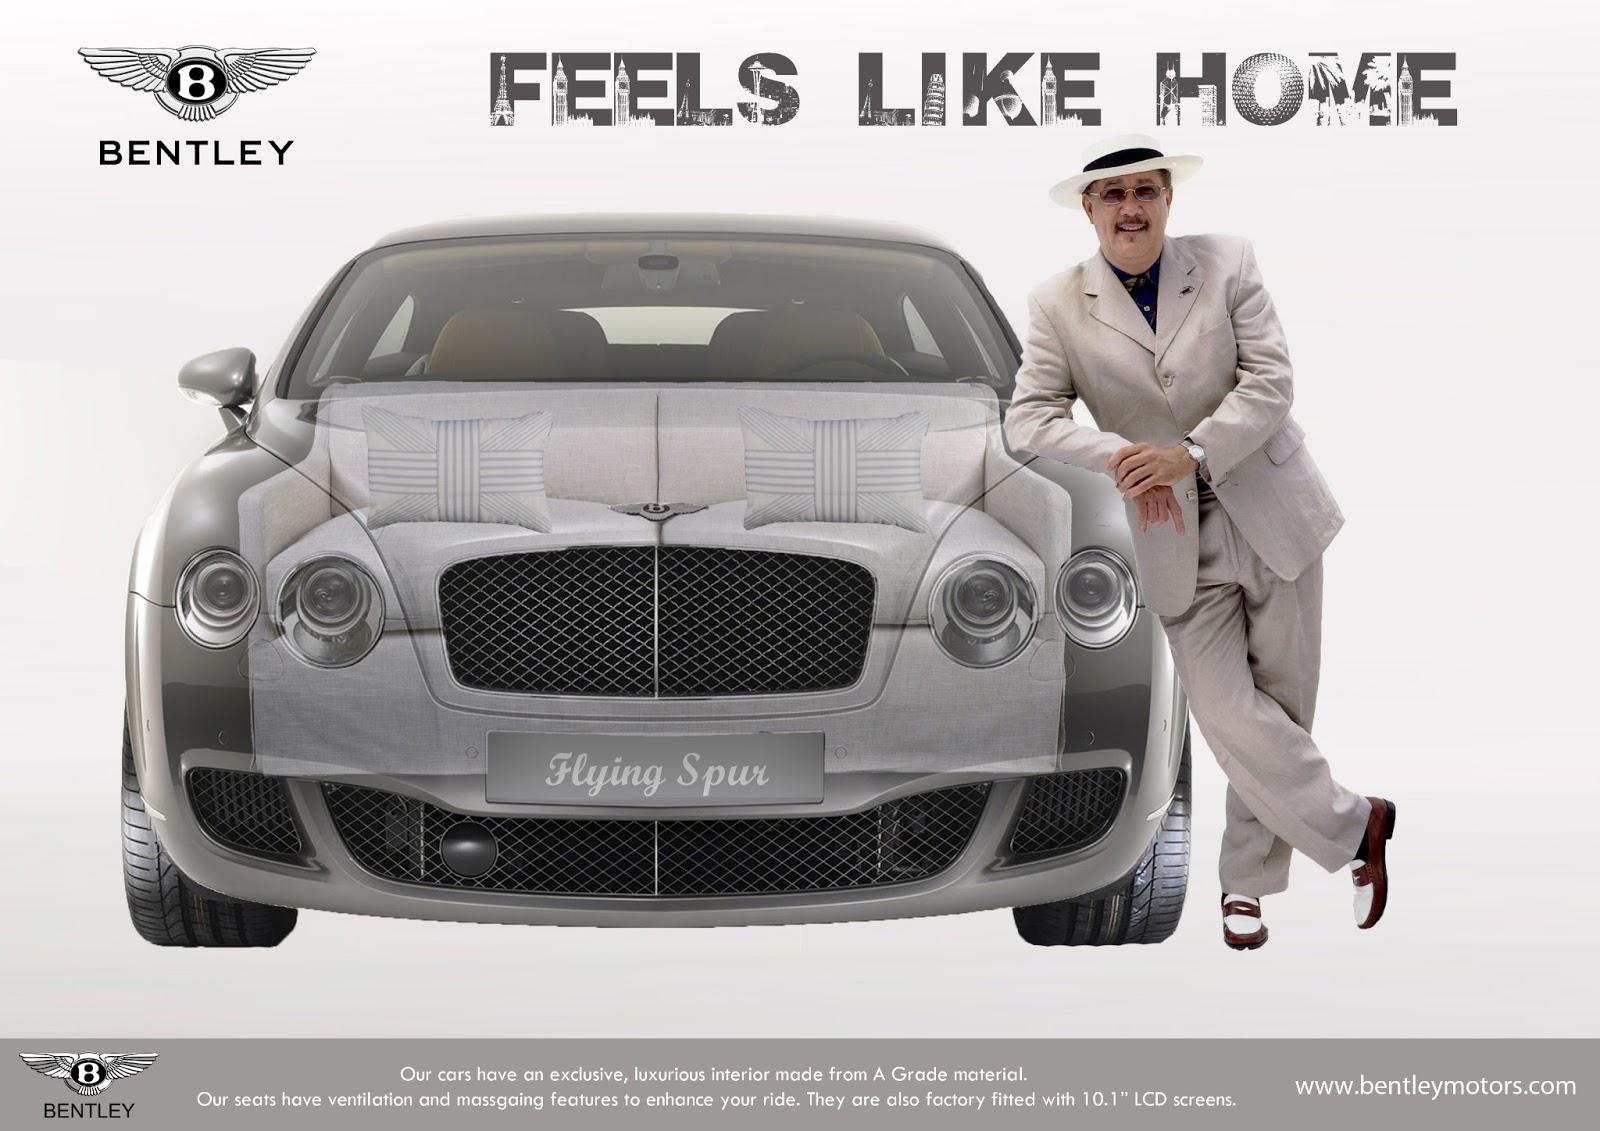 Media Learning Blog Bentley Advert By Haris Ahmed